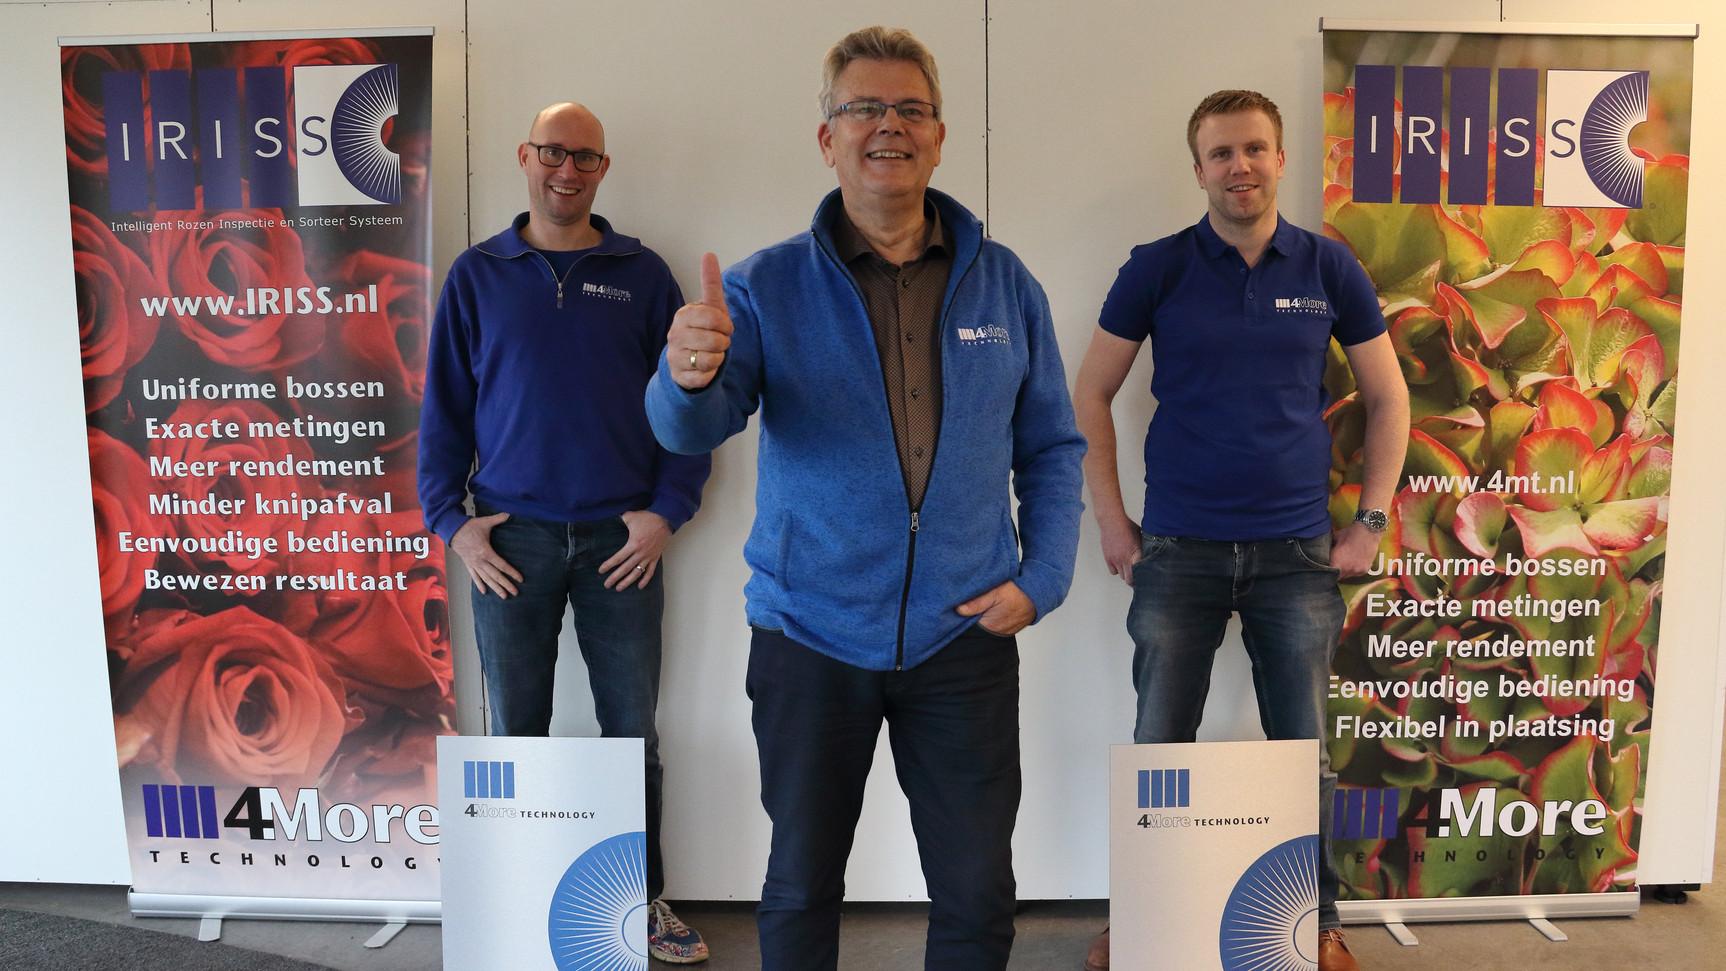 Tim van der Elst, Operations Manager Kees Bukman, Oprichter Wouter Vreugdenhil, Algemeen directeur